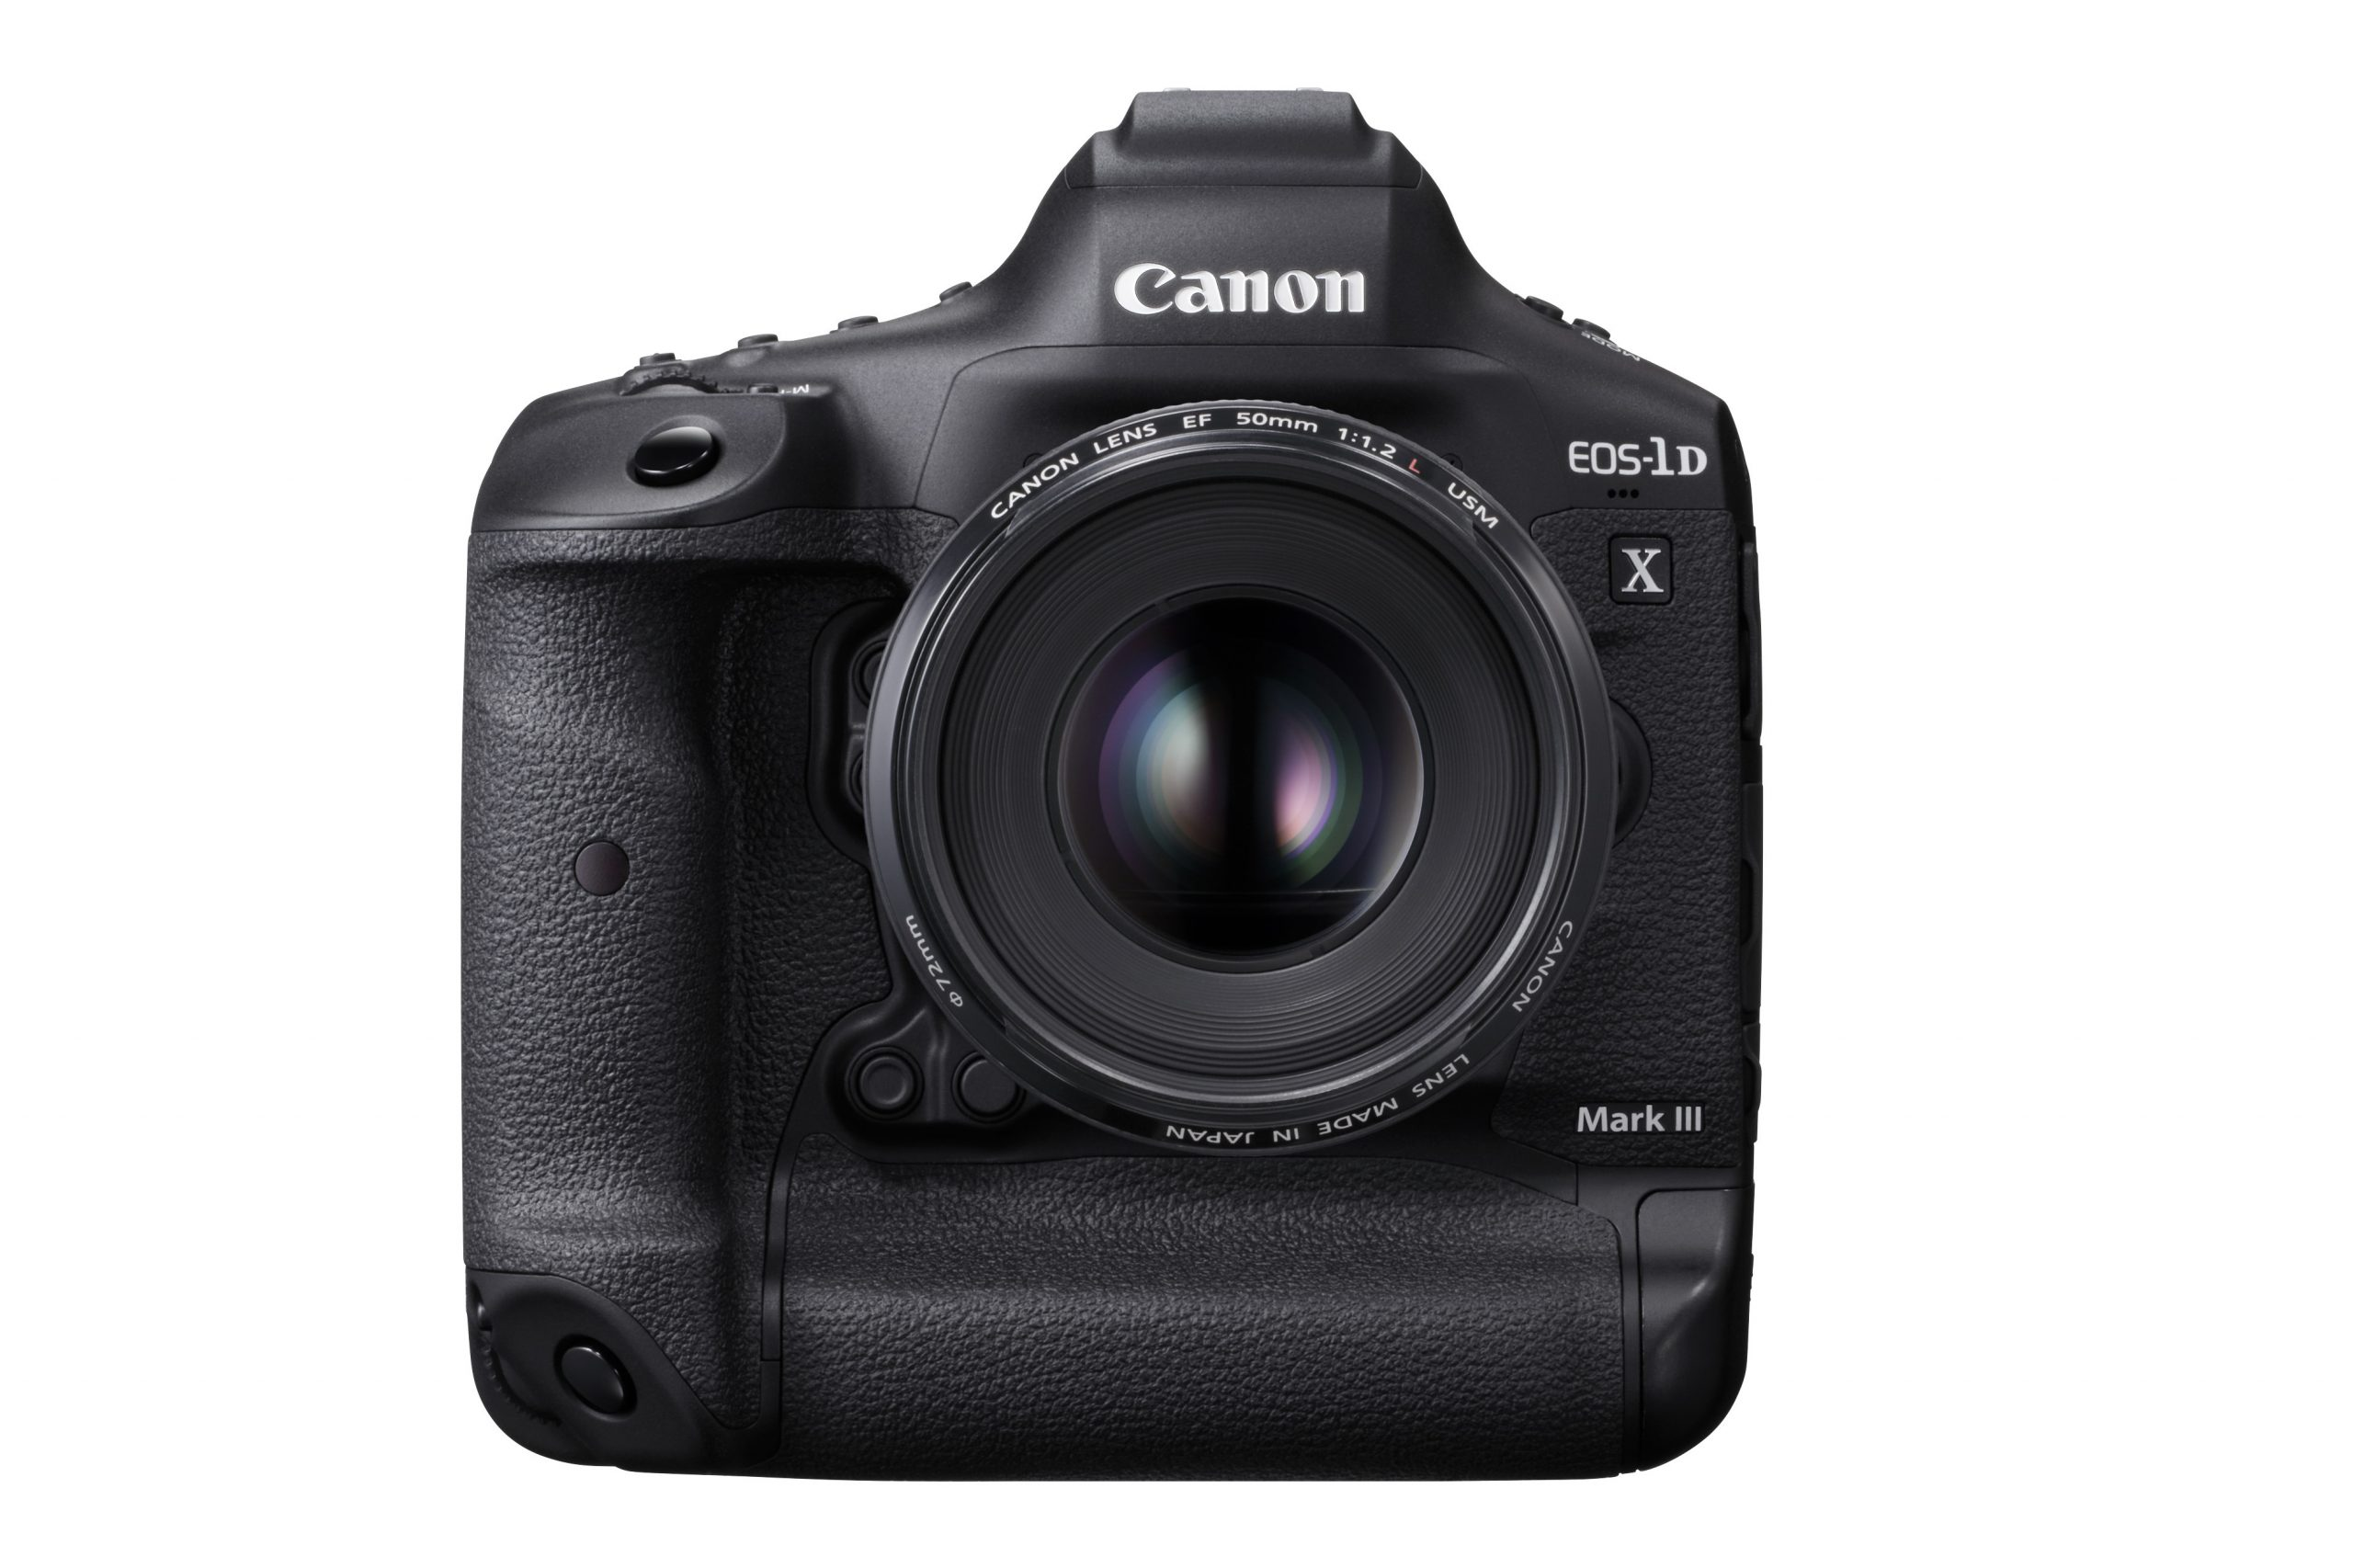 Canon EOS 1D X Mark III CES 2020